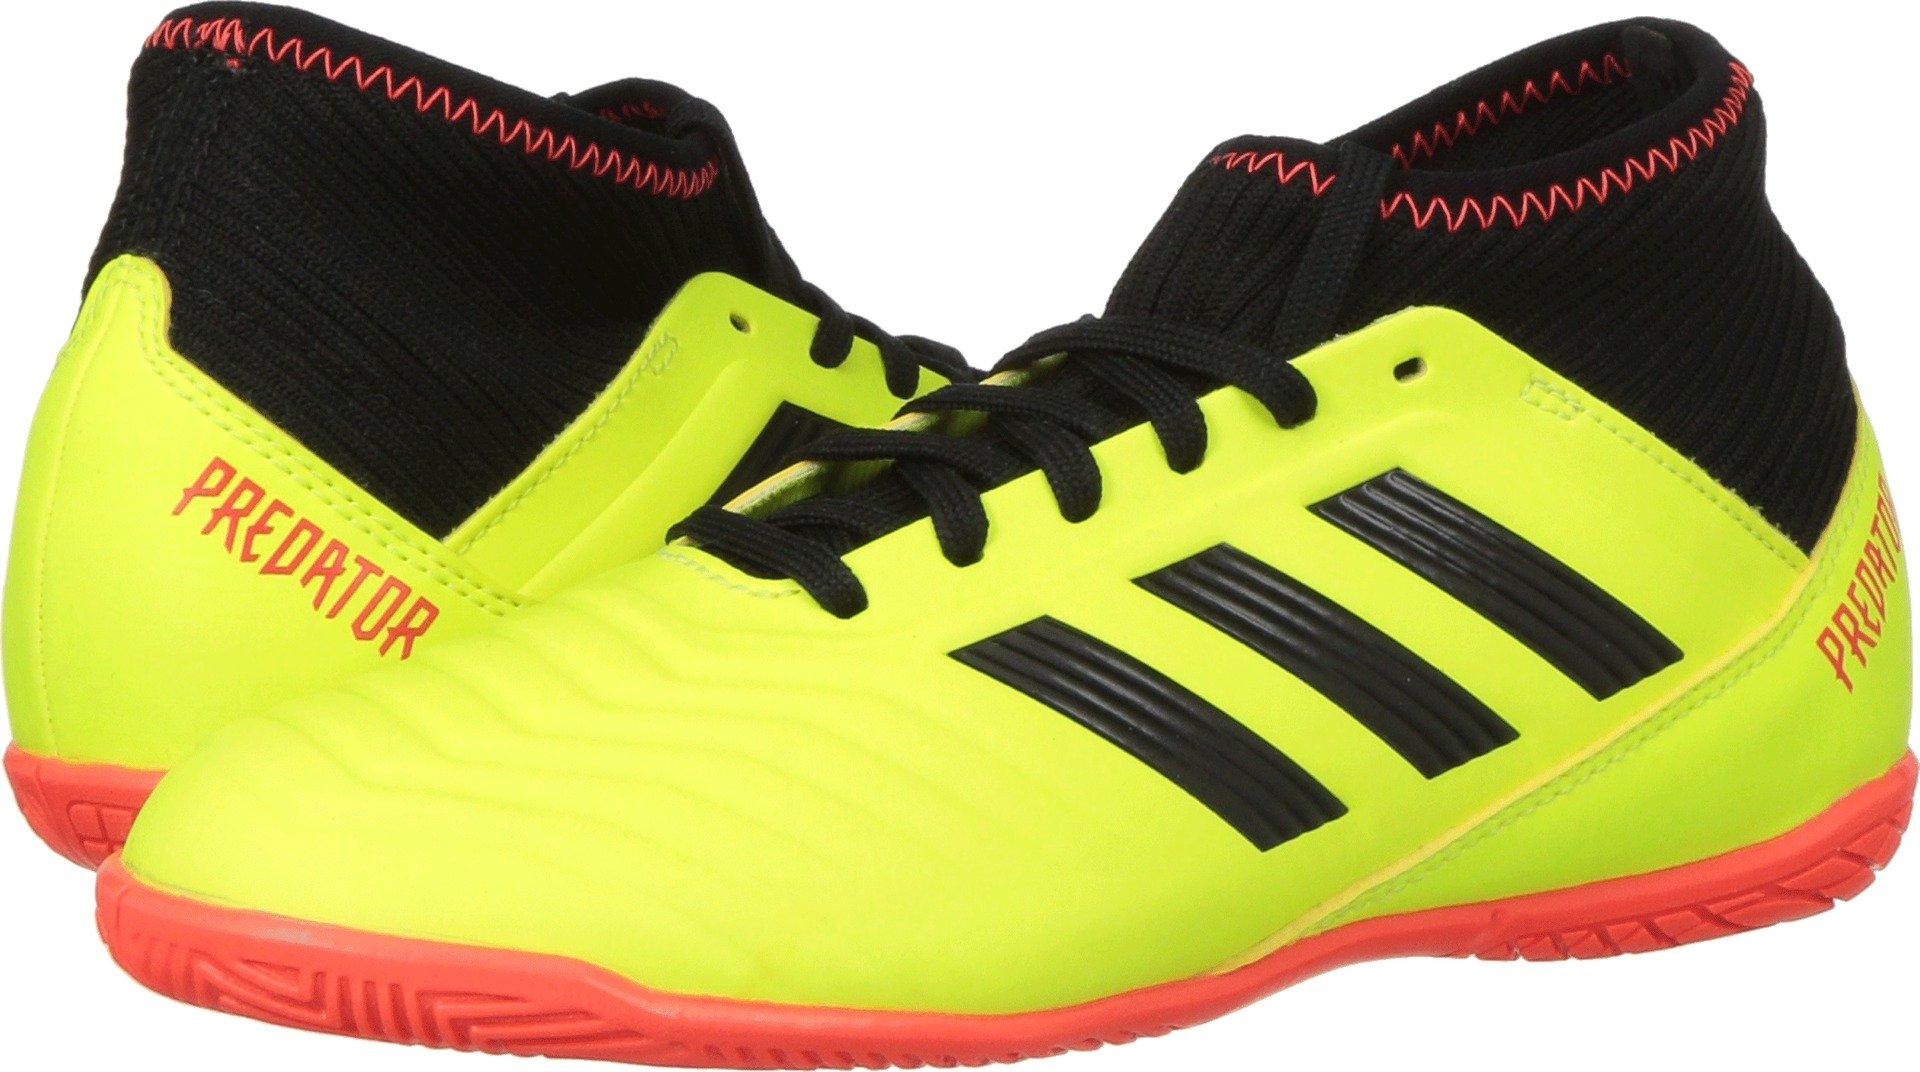 adidas Unisex-Kids Predator Tango 18.3 Indoor Soccer Shoe, Solar Yellow/Black/Solar Red, 4 M US Big Kid